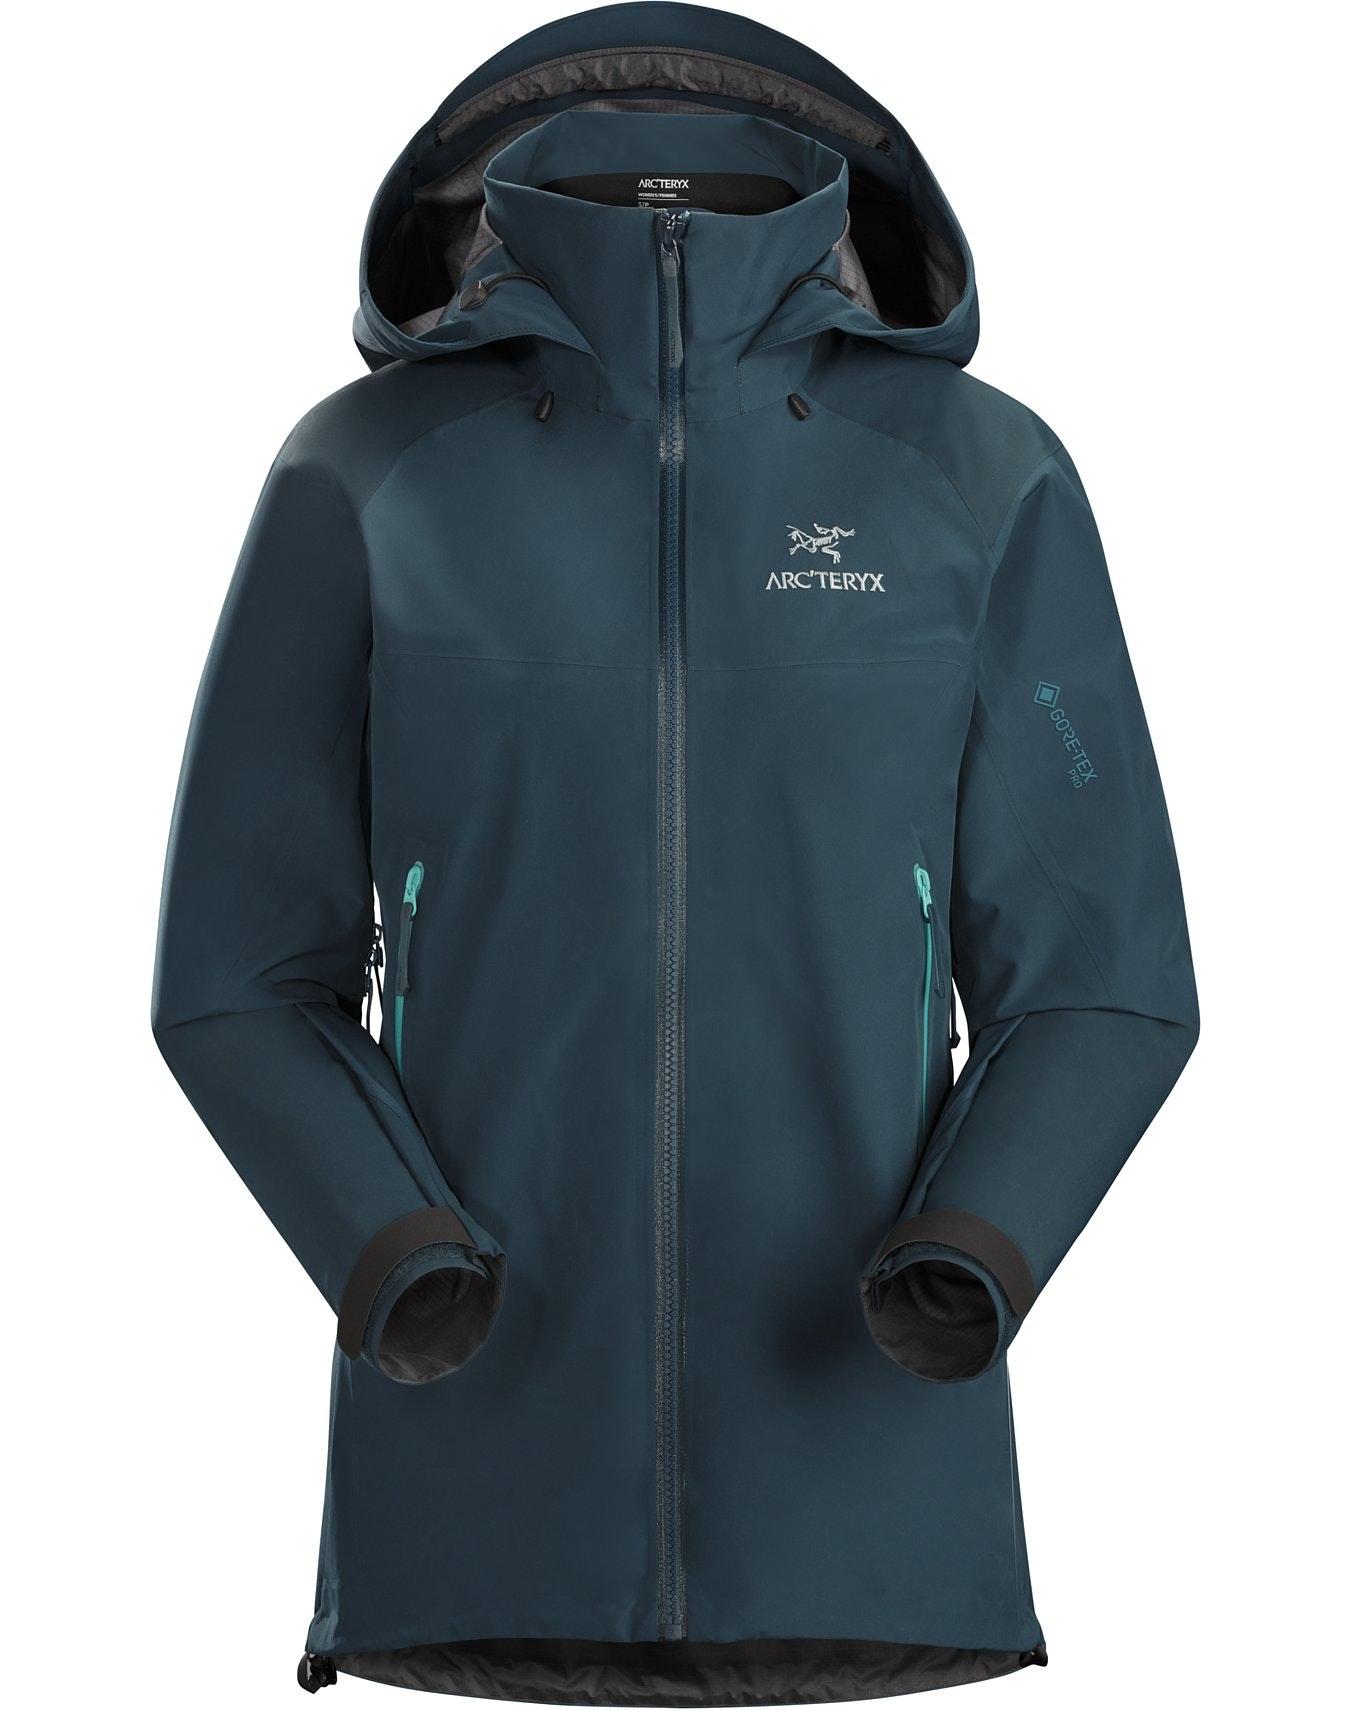 beta ar jacket damen  bekleidung damen sweatshirt c 1_18 #6